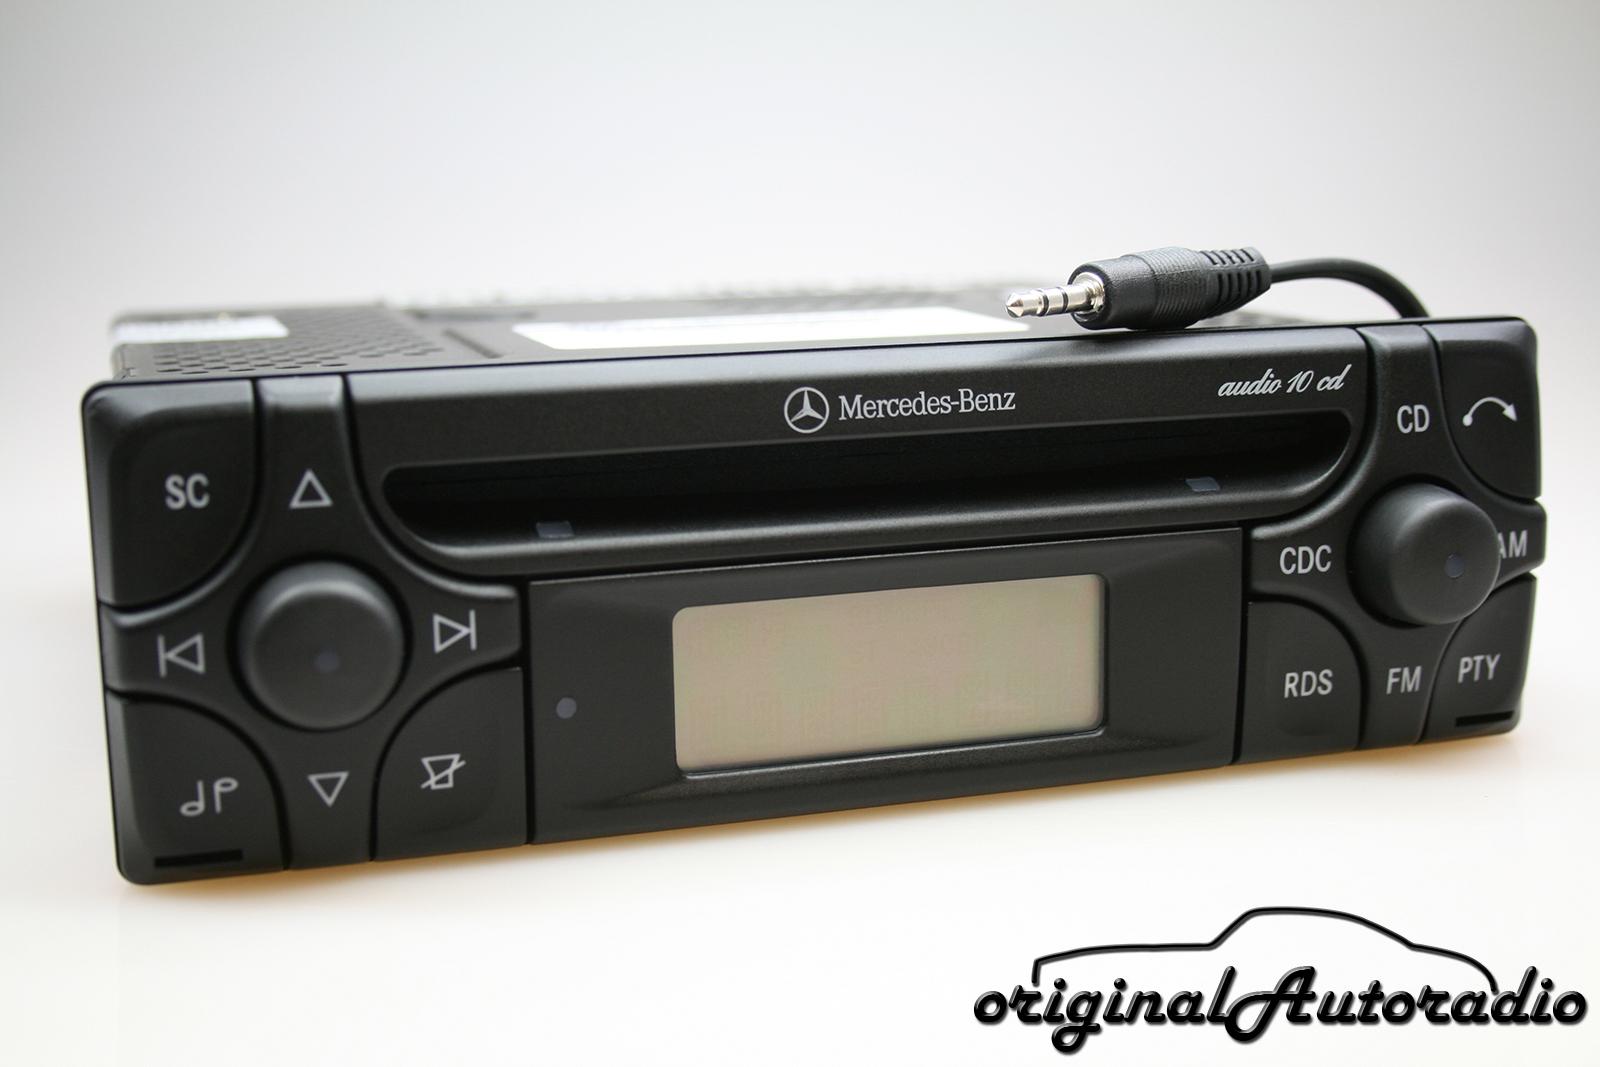 Original-Autoradio.de - Mercedes Audio 10 CD MF2910 CD-R Alpine ...